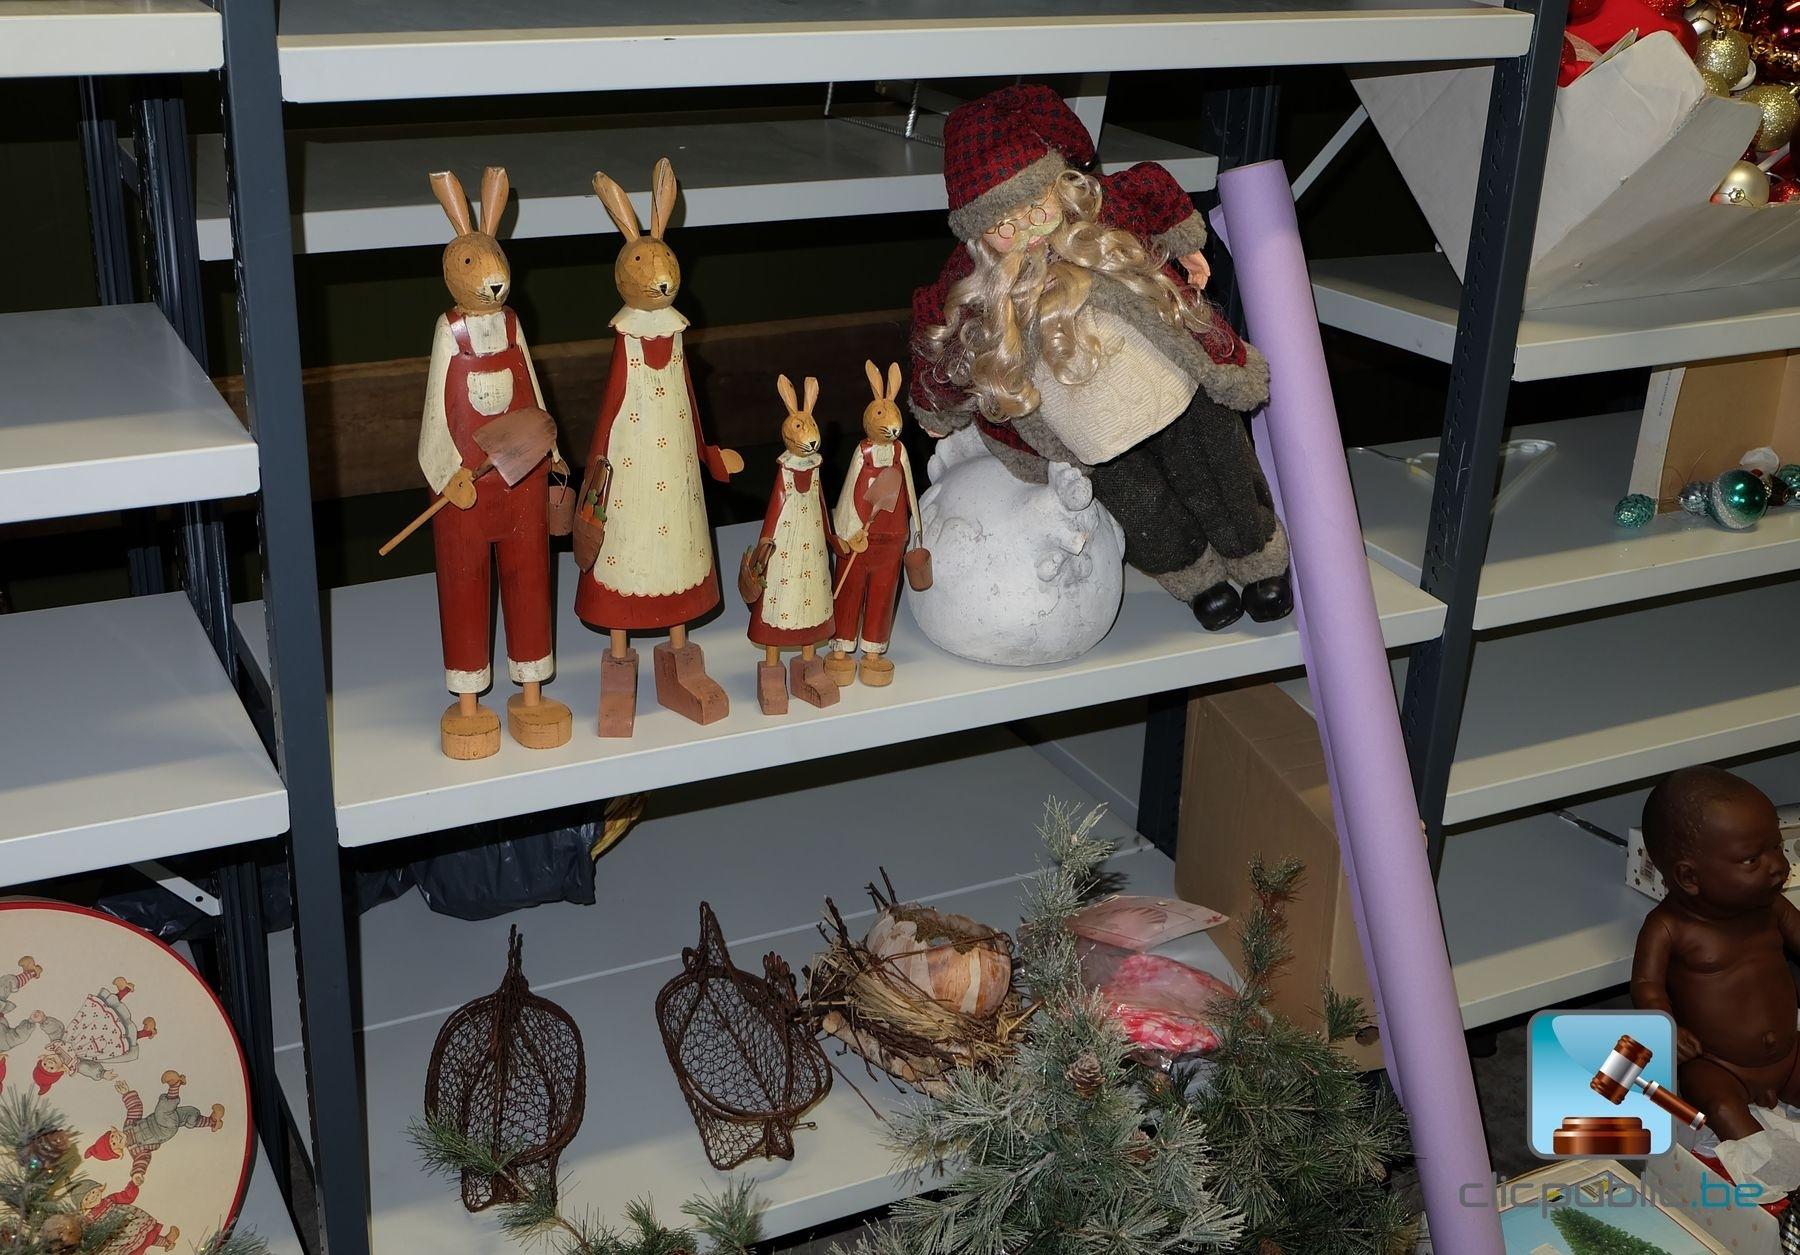 #6B392A Décorations De Noël (ref. 27) à Vendre Sur Clicpublic.be 5319 decorations de noel a vendre 1800x1255 px @ aertt.com